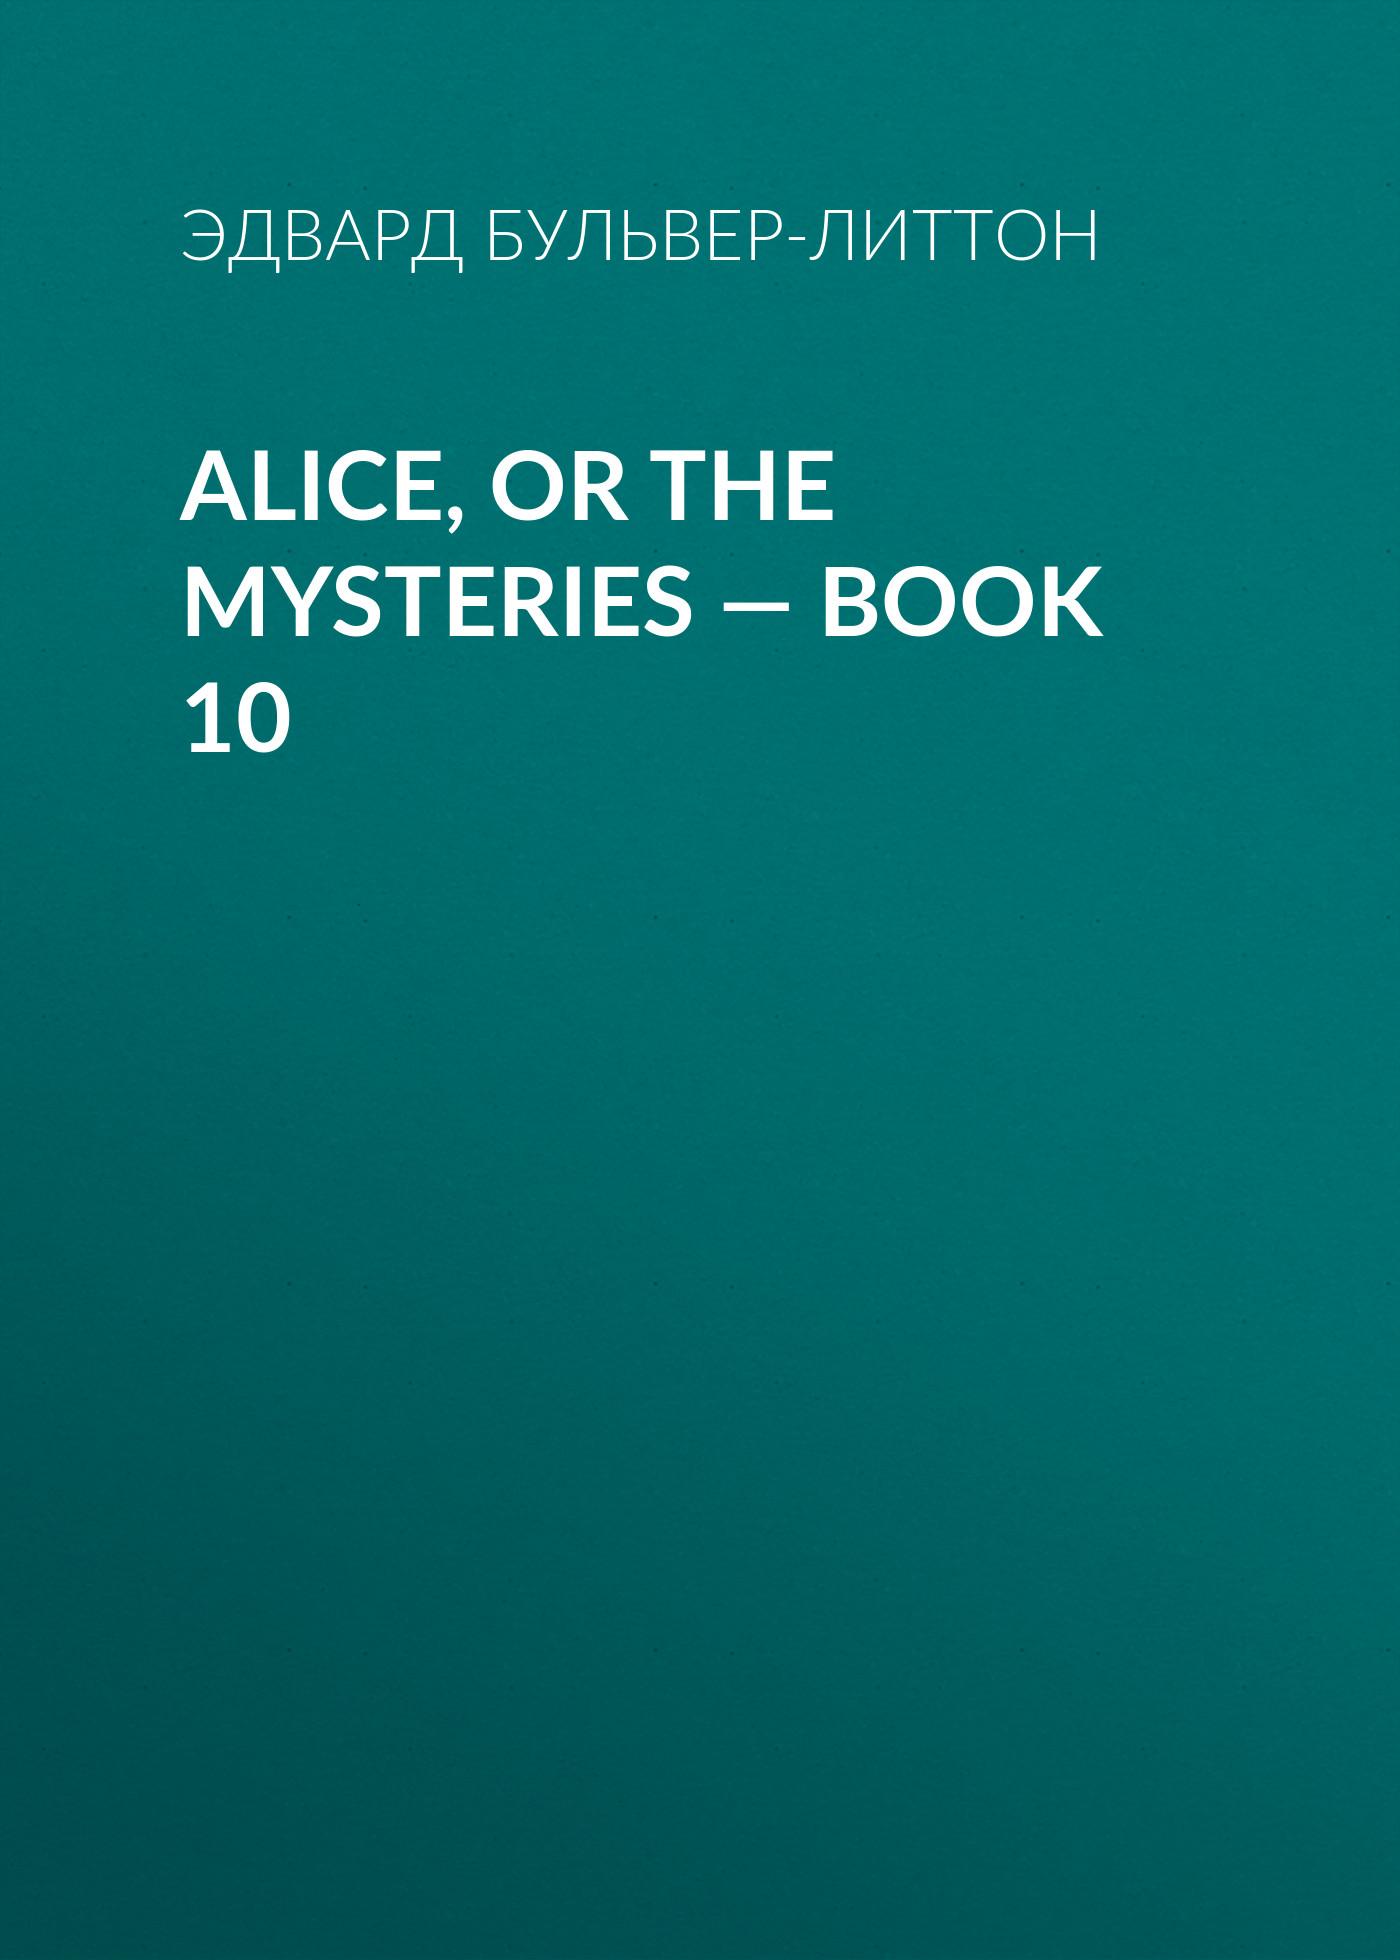 Эдвард Бульвер-Литтон Alice, or the Mysteries — Book 10